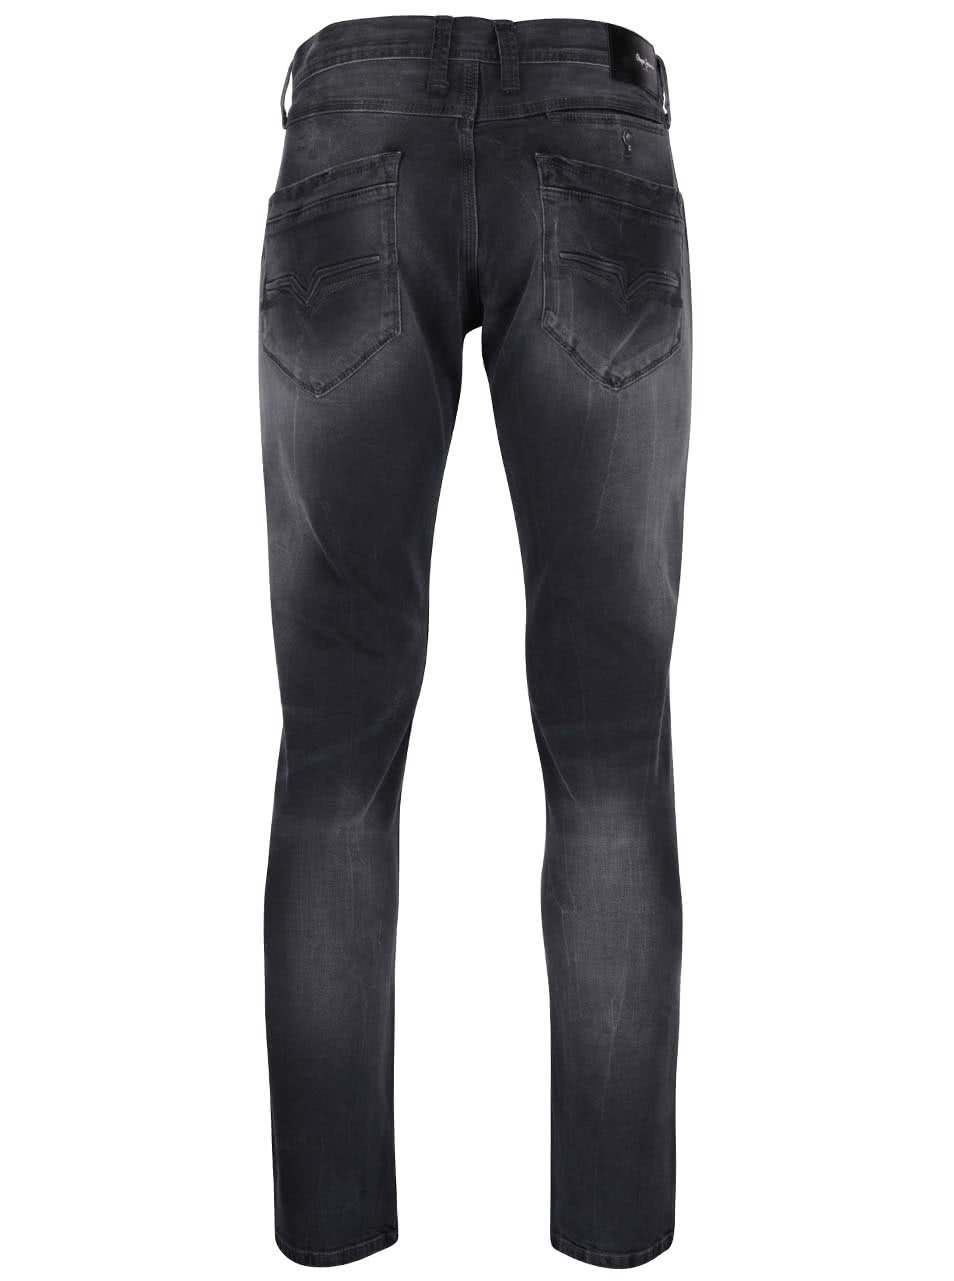 Tmavě šedé pánské slim džíny Pepe Jeans Spike ... 5b474403e9